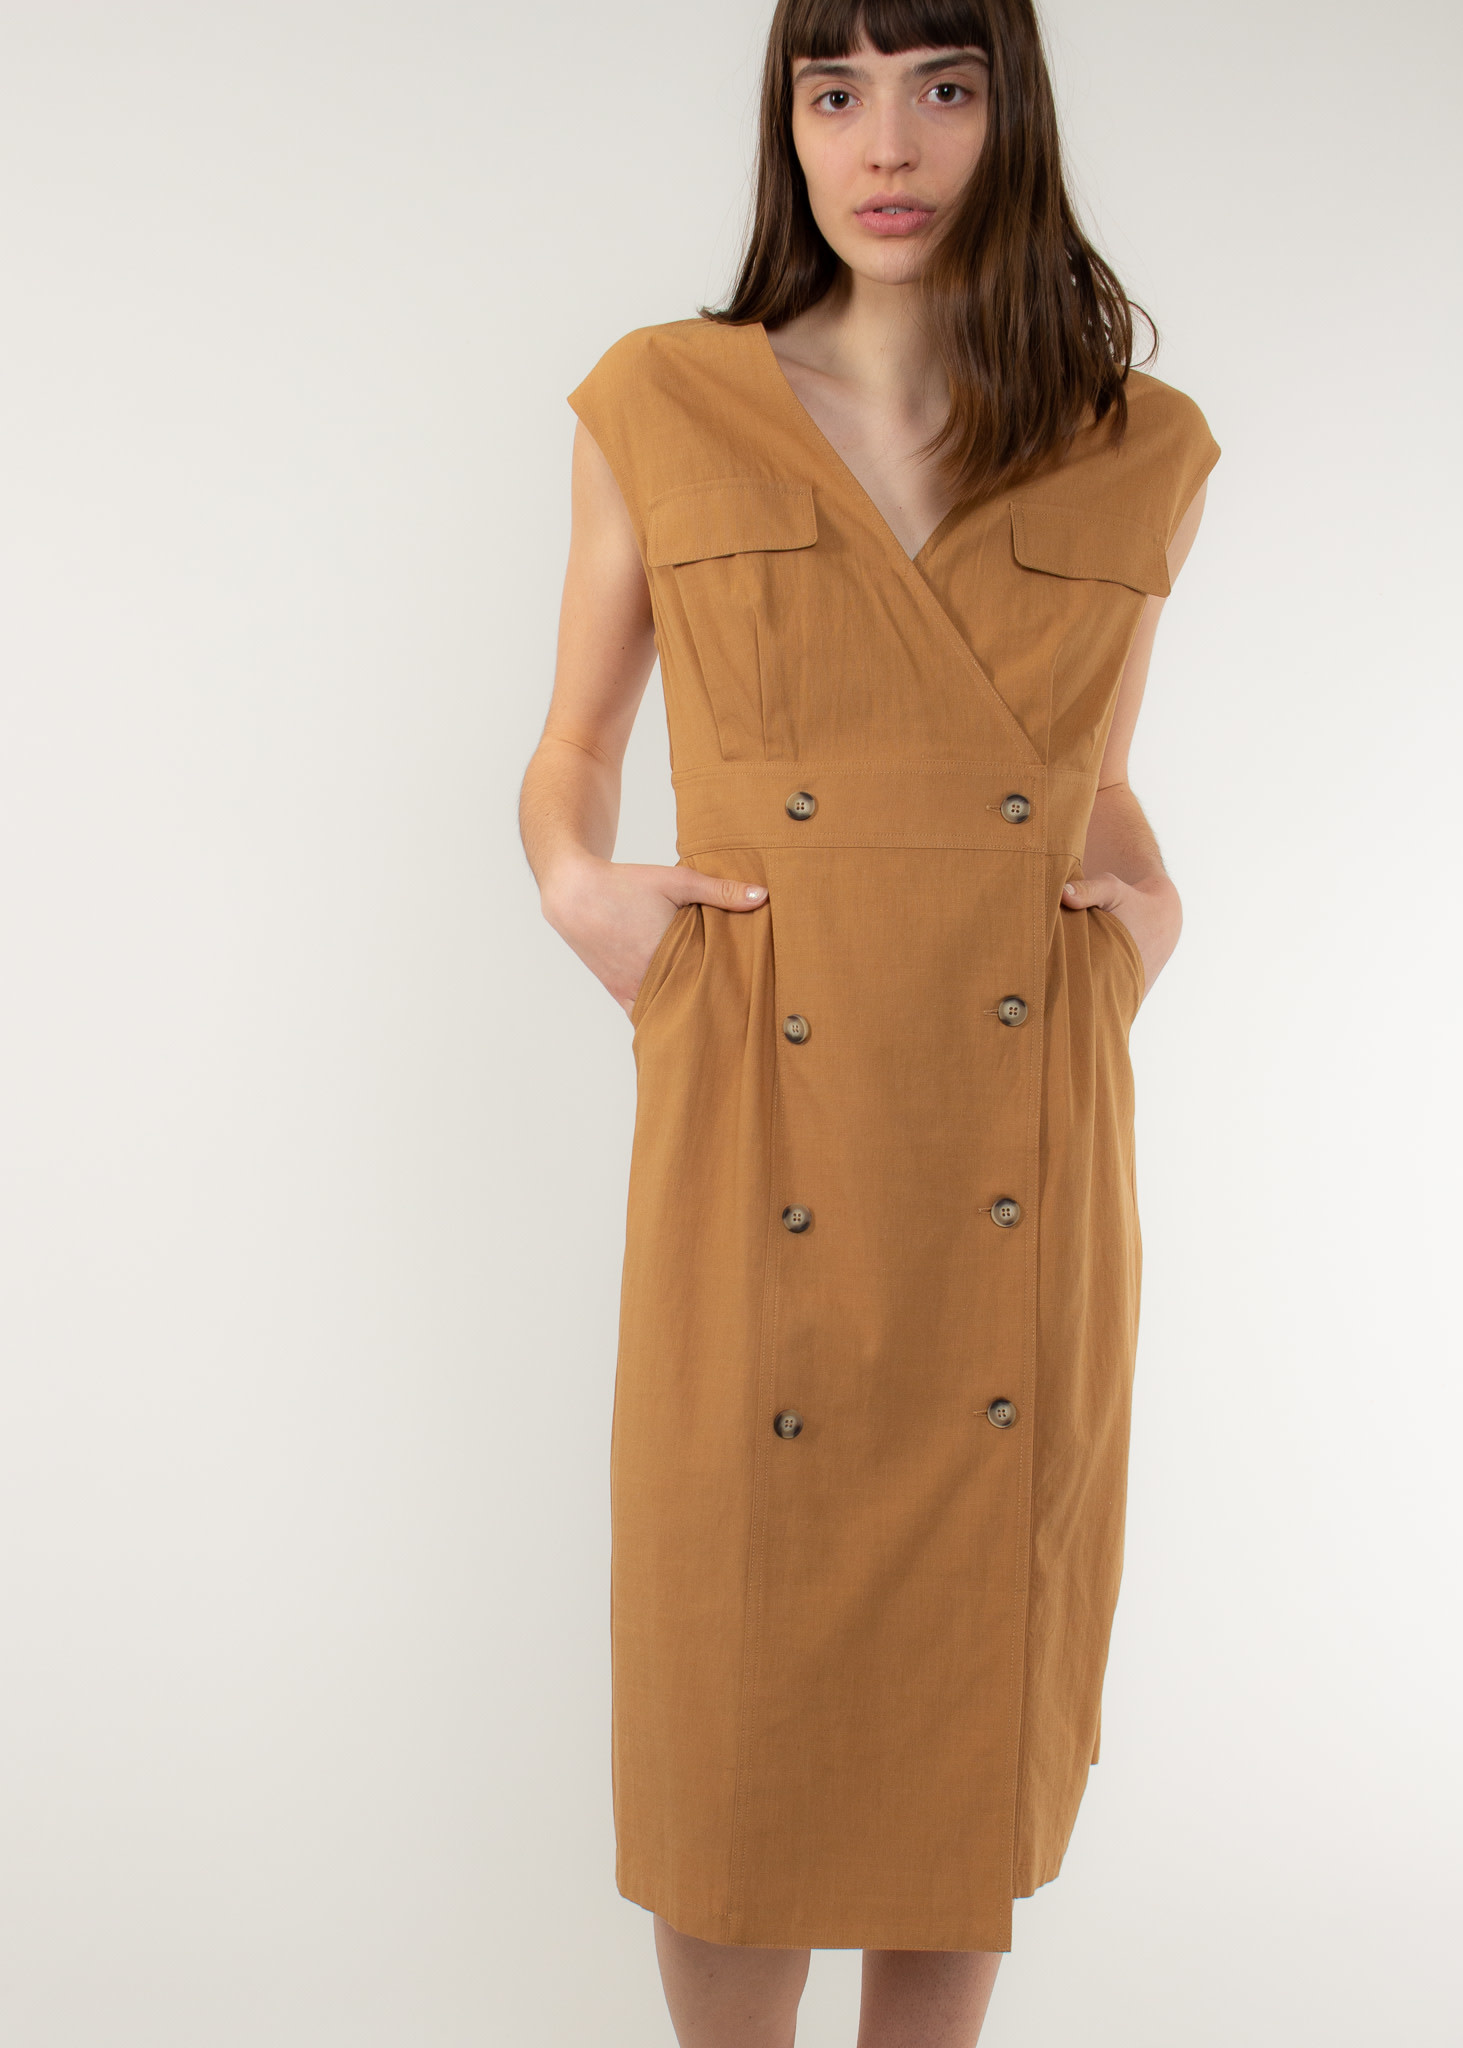 The Korner 20121073 dress